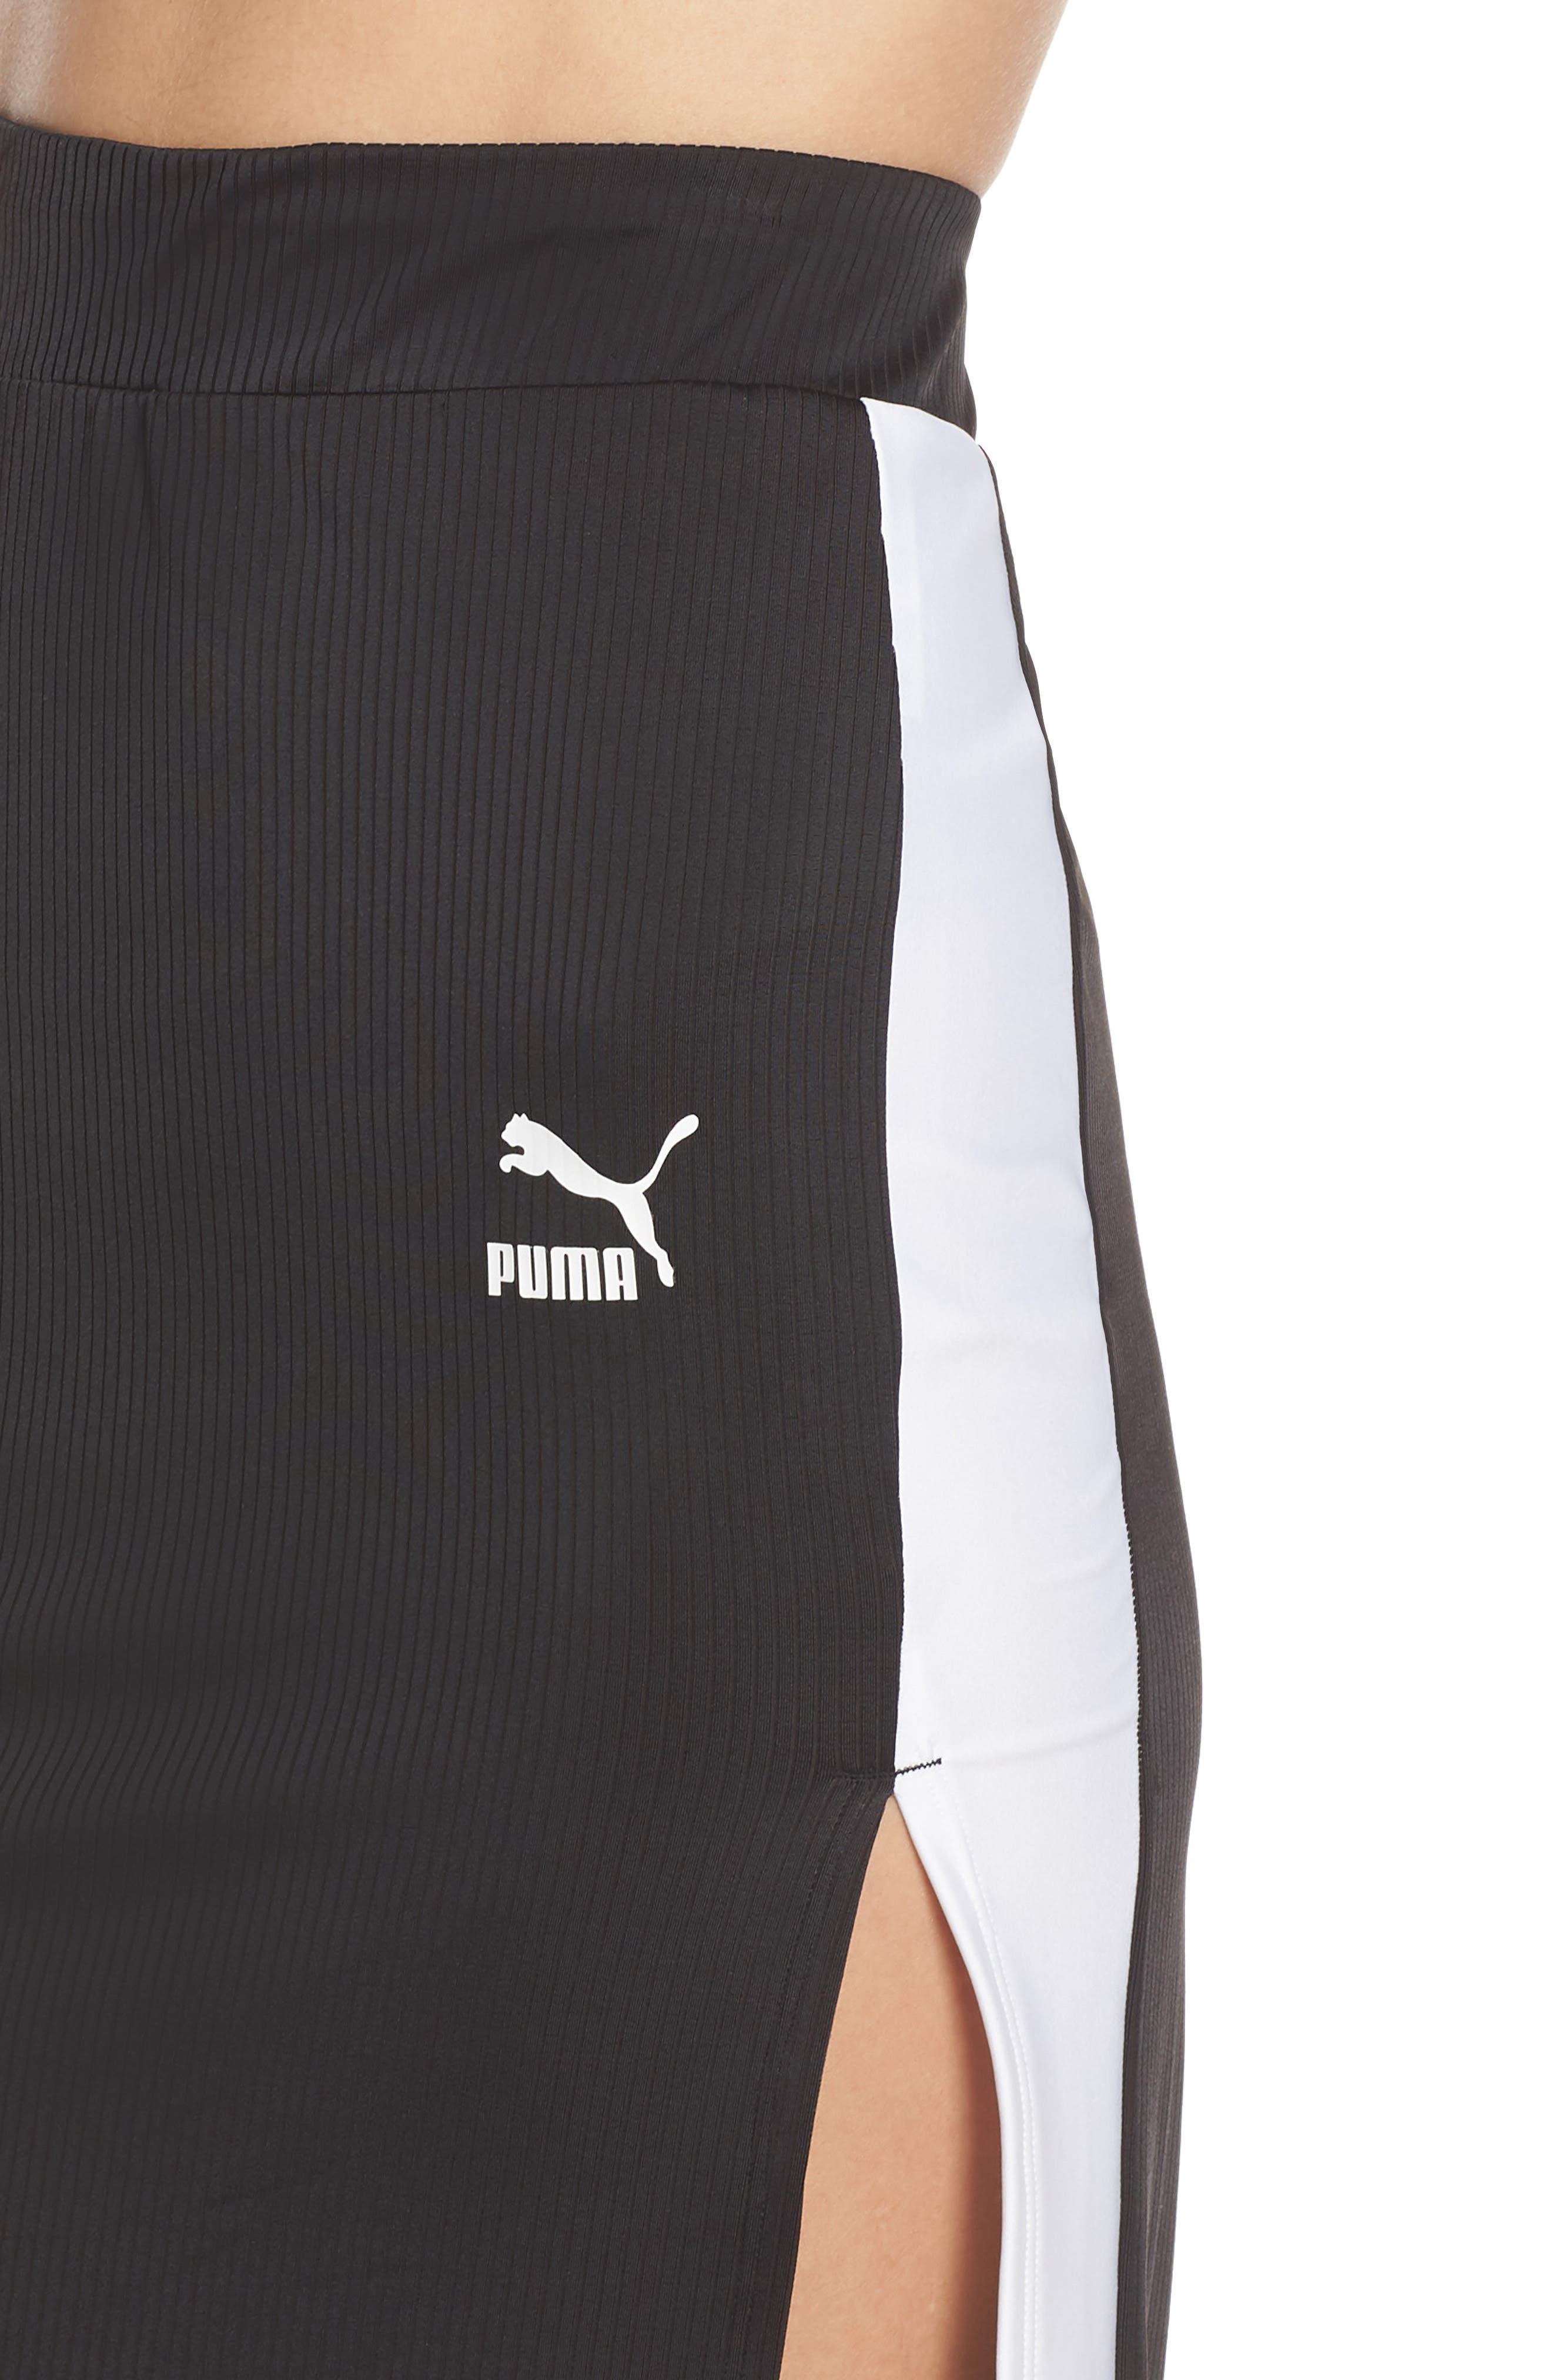 PUMA, Classics Ribbed Skirt, Alternate thumbnail 5, color, 001